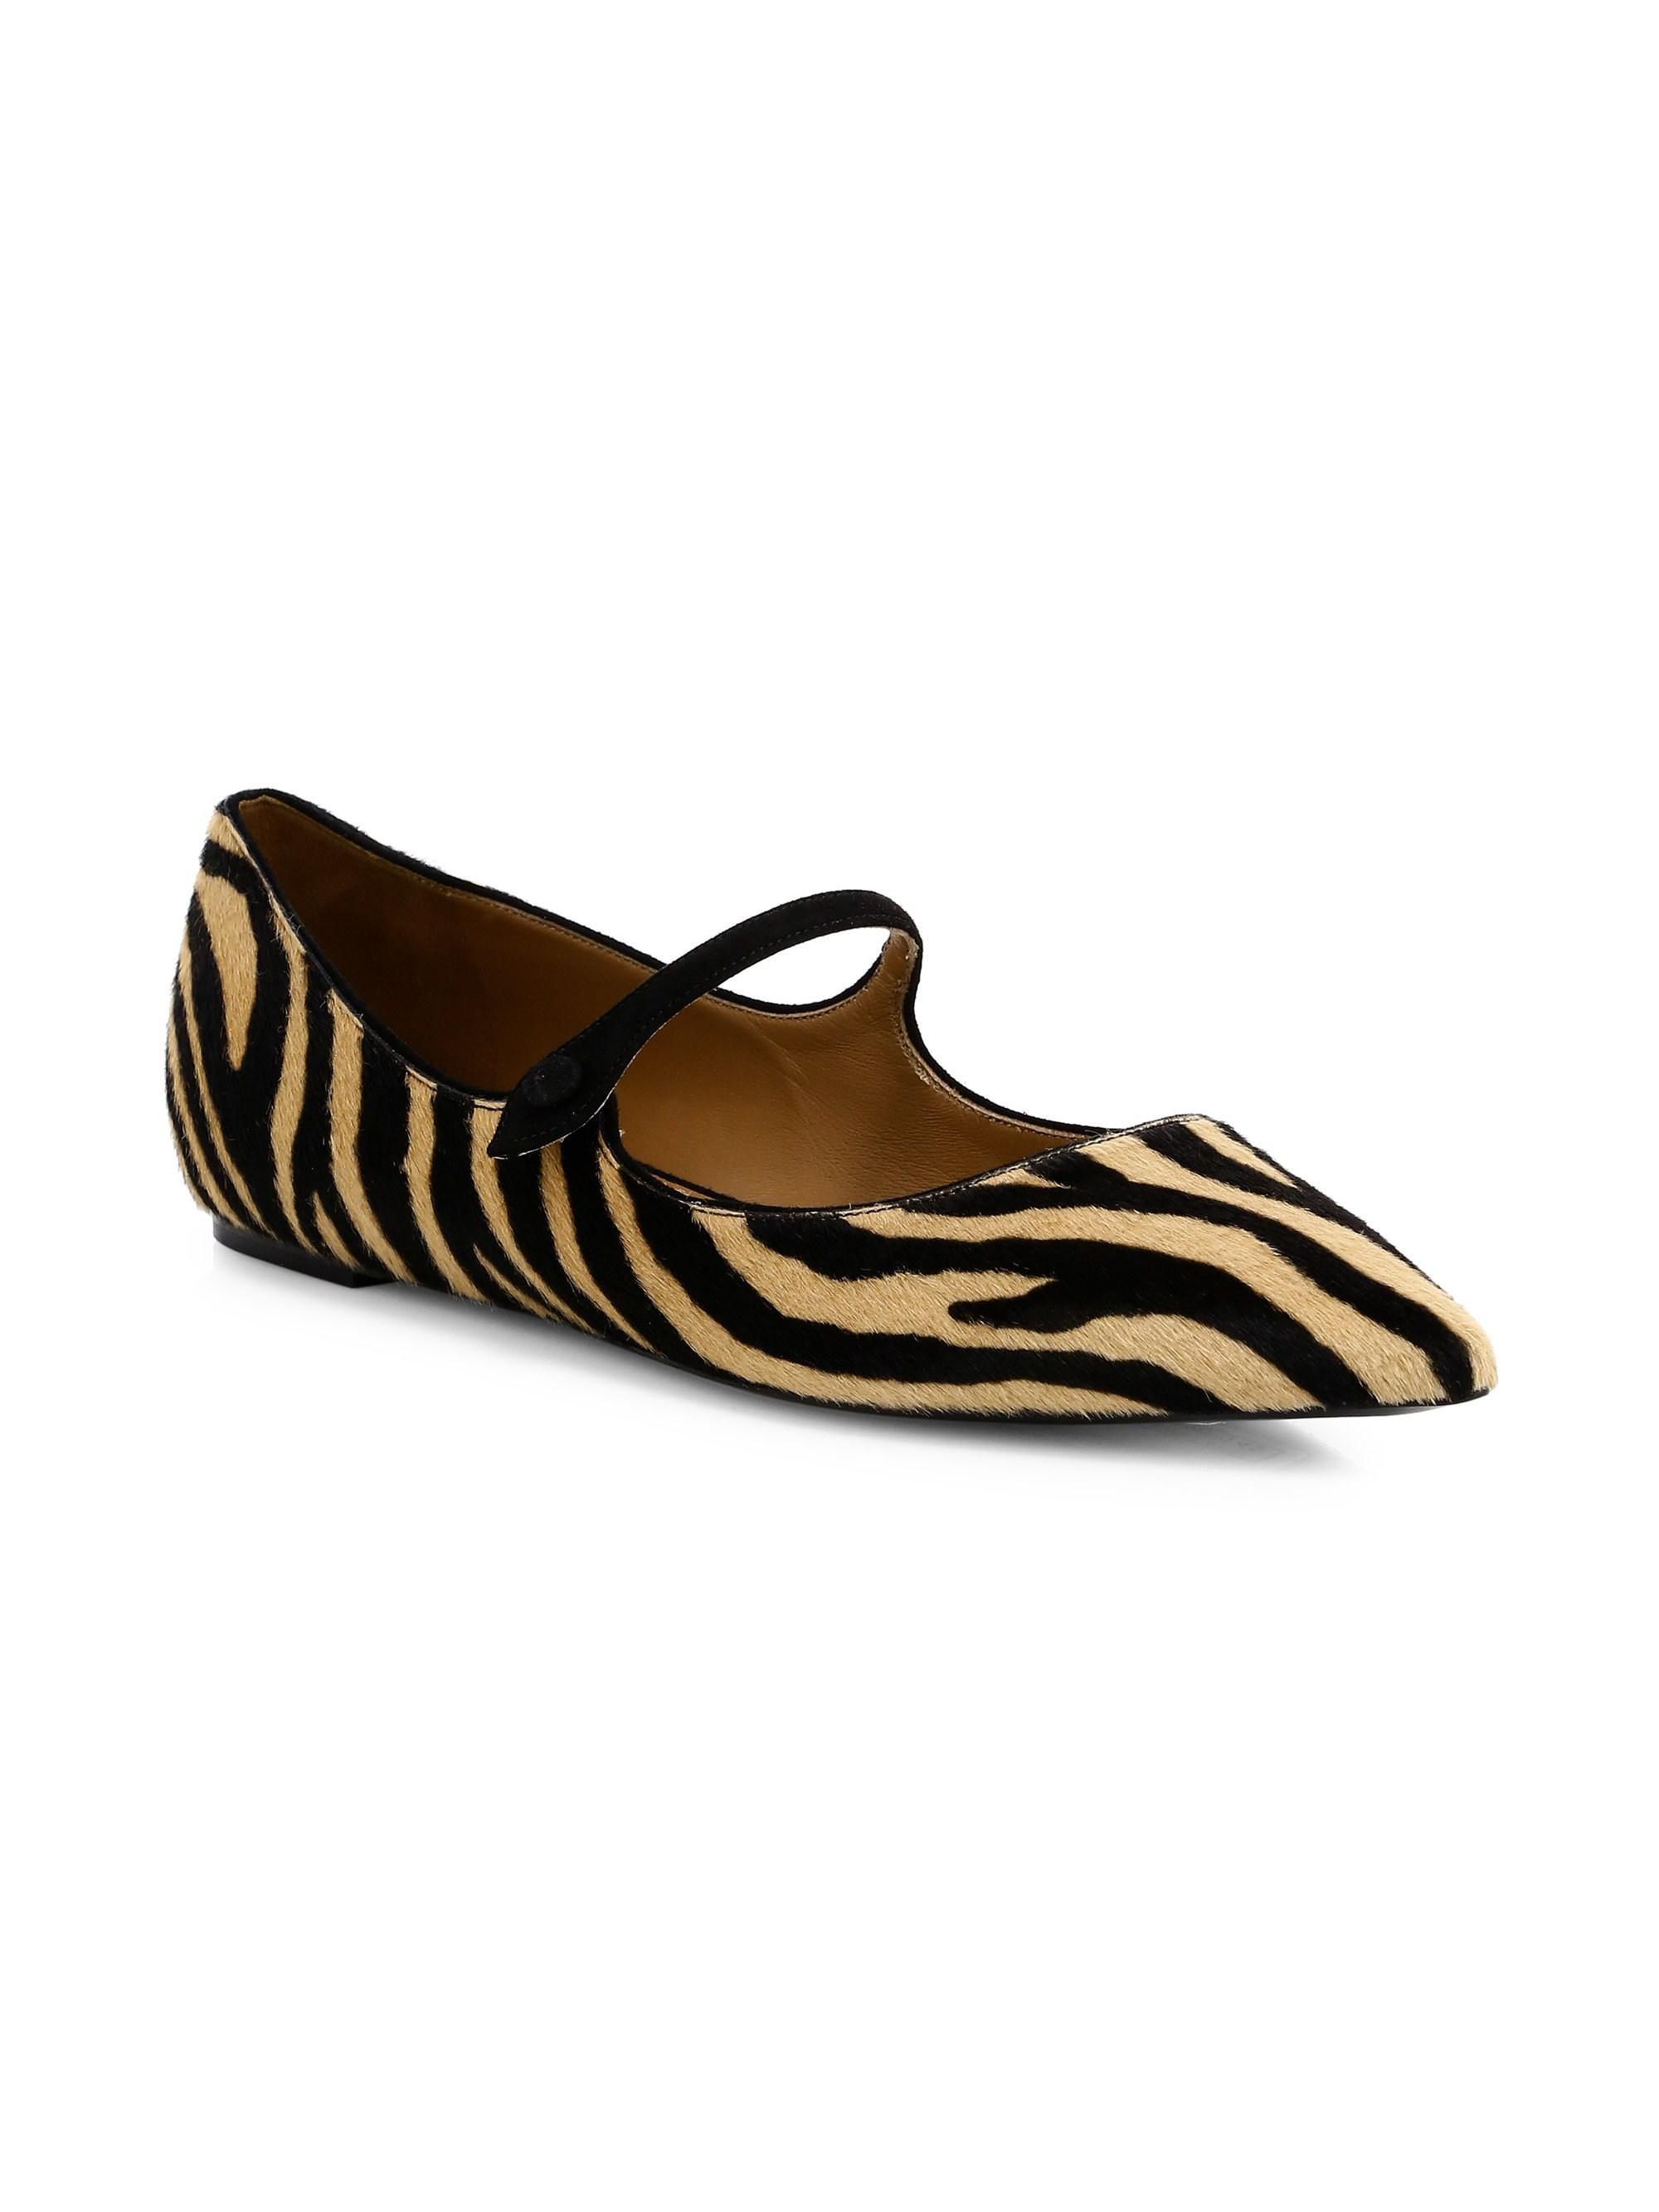 411078531e28e Lyst - Tabitha Simmons Women's Hermione Zebra Print Calf Hair ...